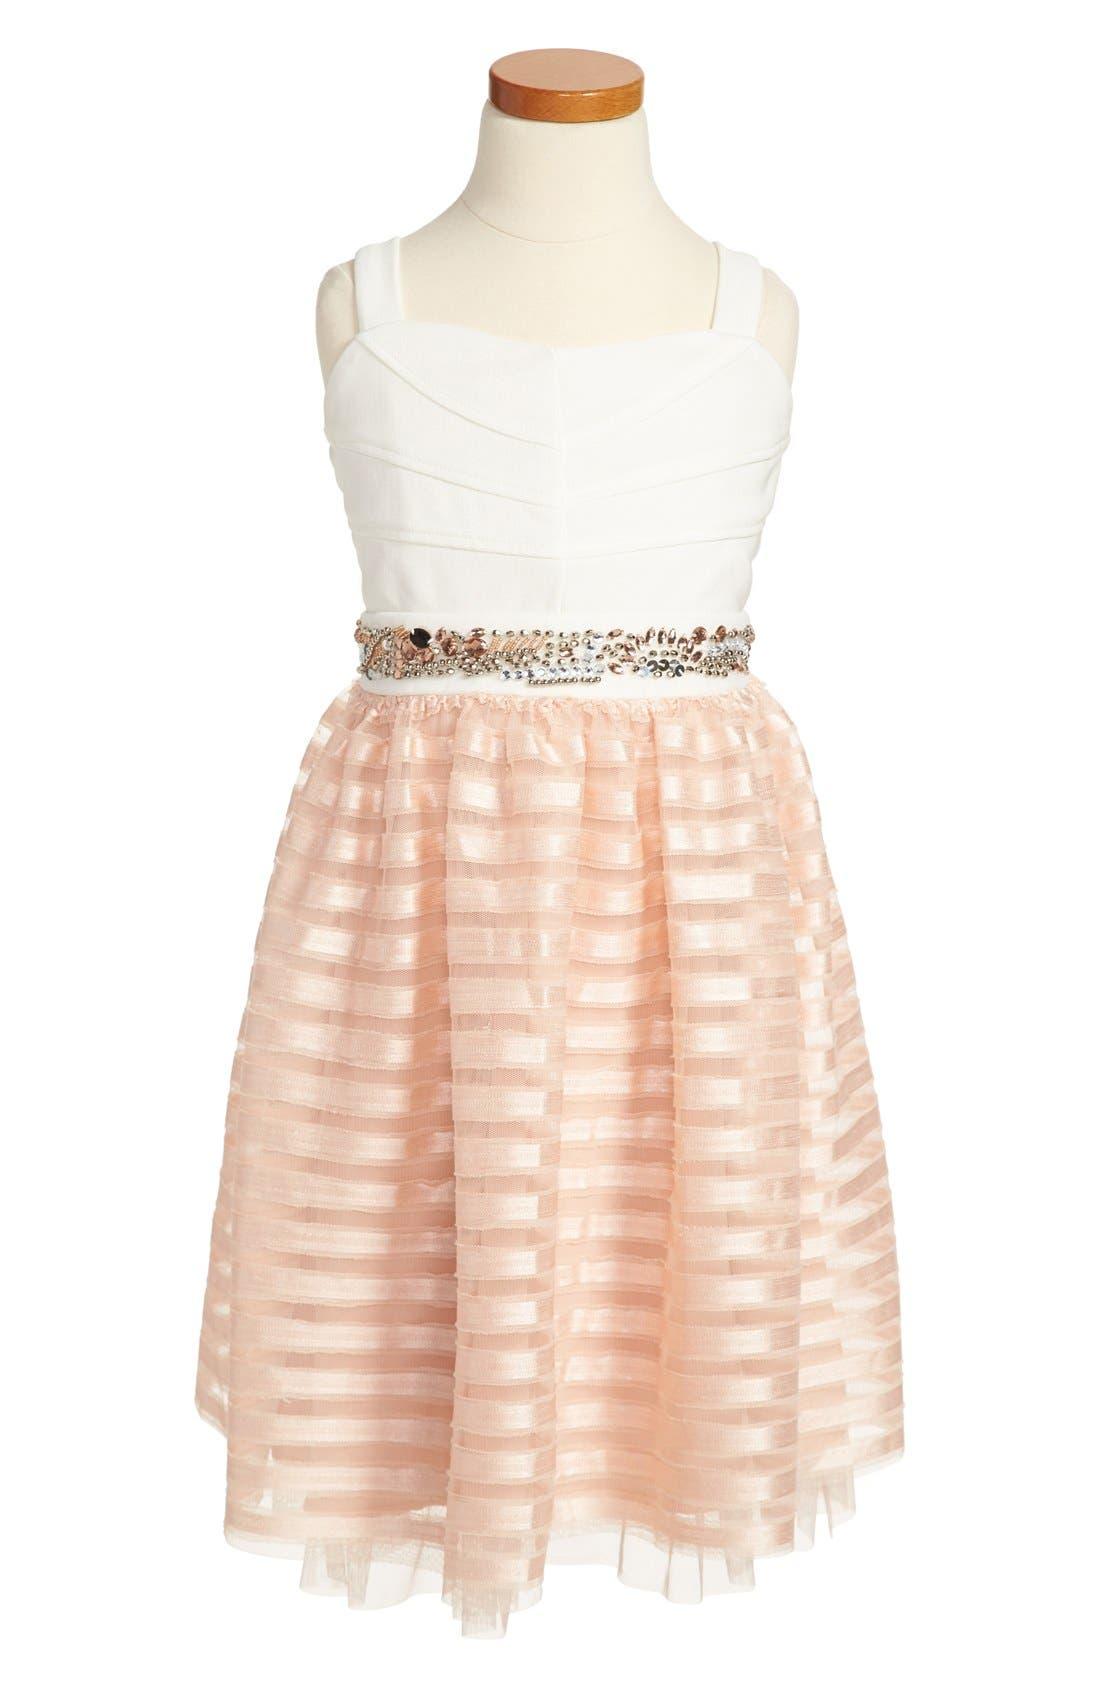 Alternate Image 1 Selected - Roxette Jeweled Waist Dress (Big Girls)